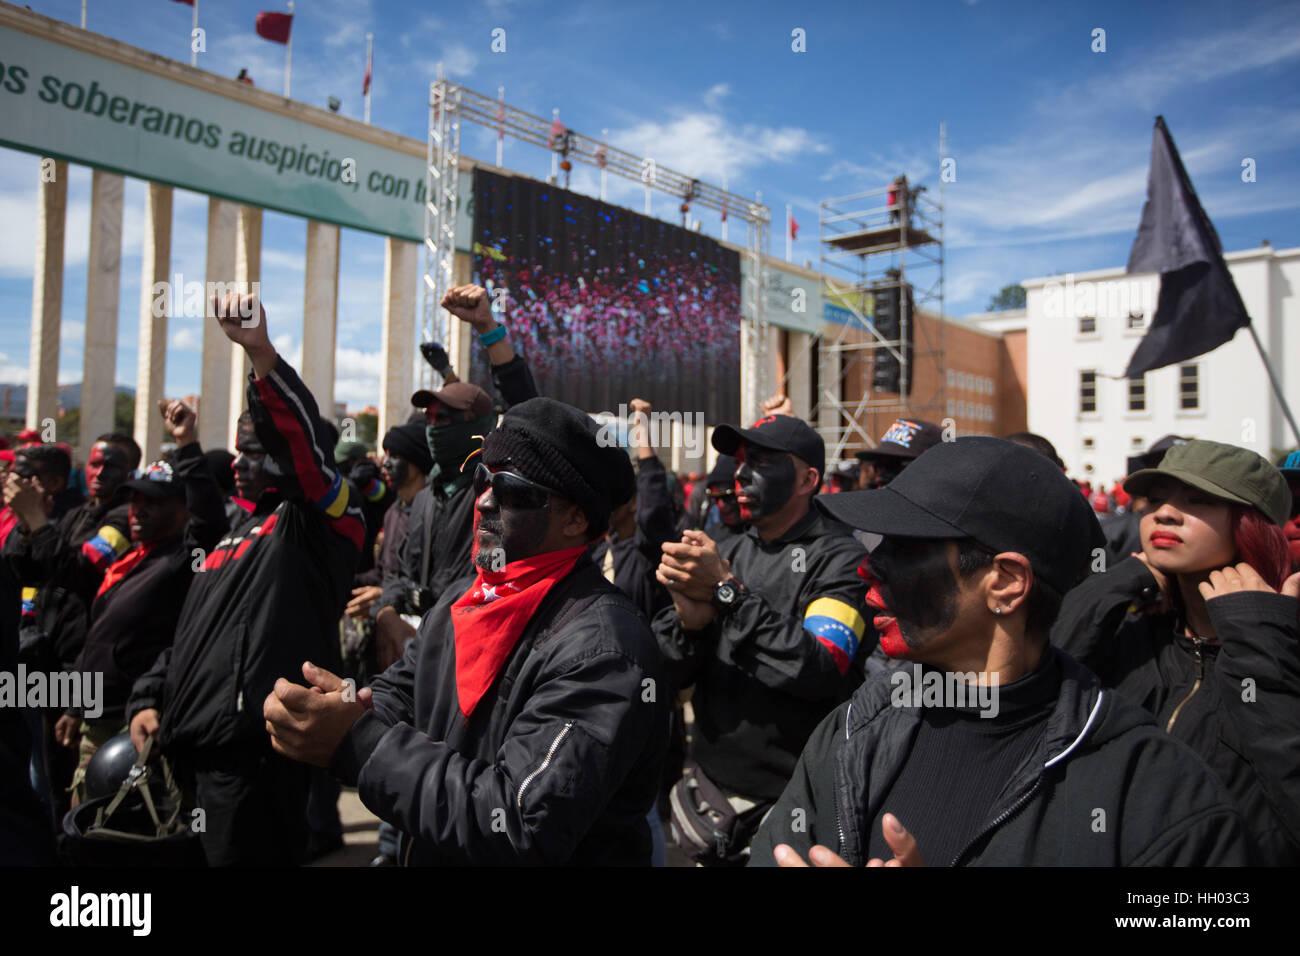 Caracas, Venezuela. 14th Jan, 2017. Supporters of Venezuelan President Nicolas Maduro participate in the Zamora - Stock Image